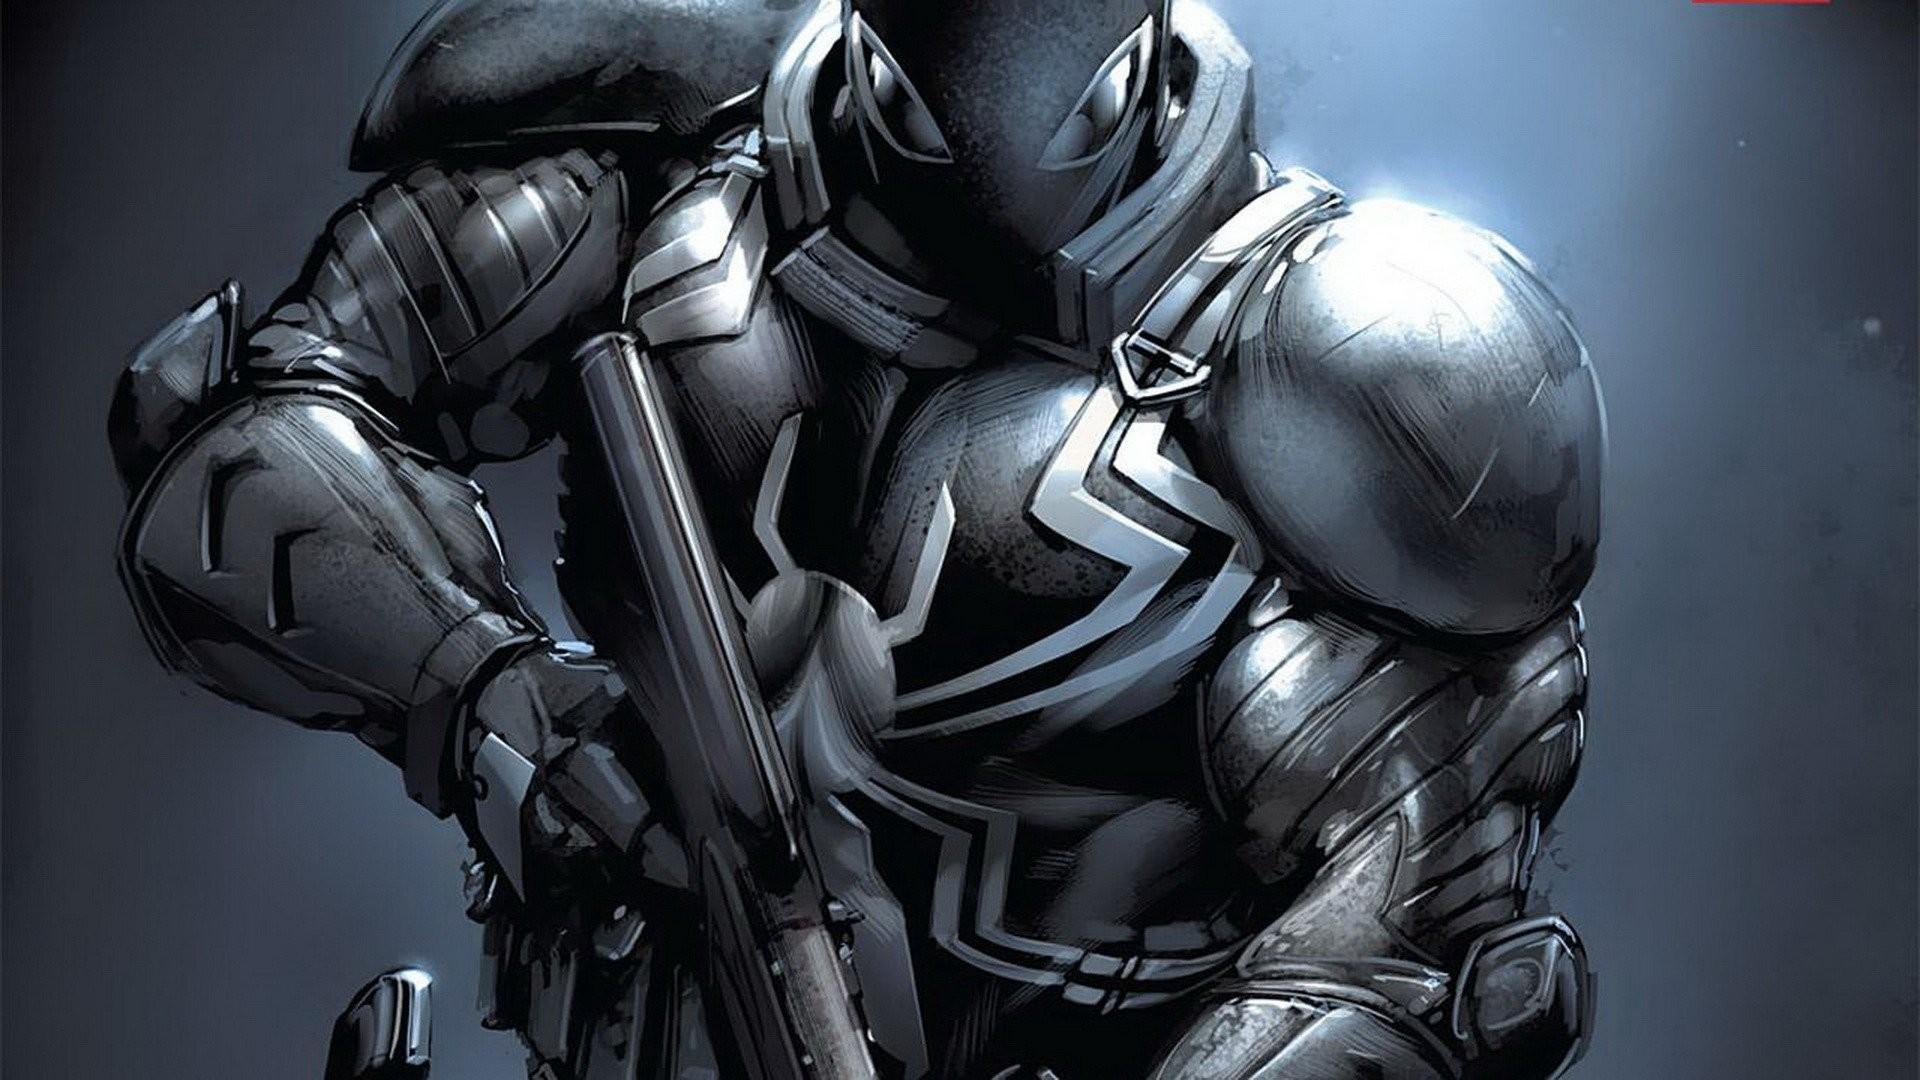 Venom And Carnage Wallpaper 59 Images